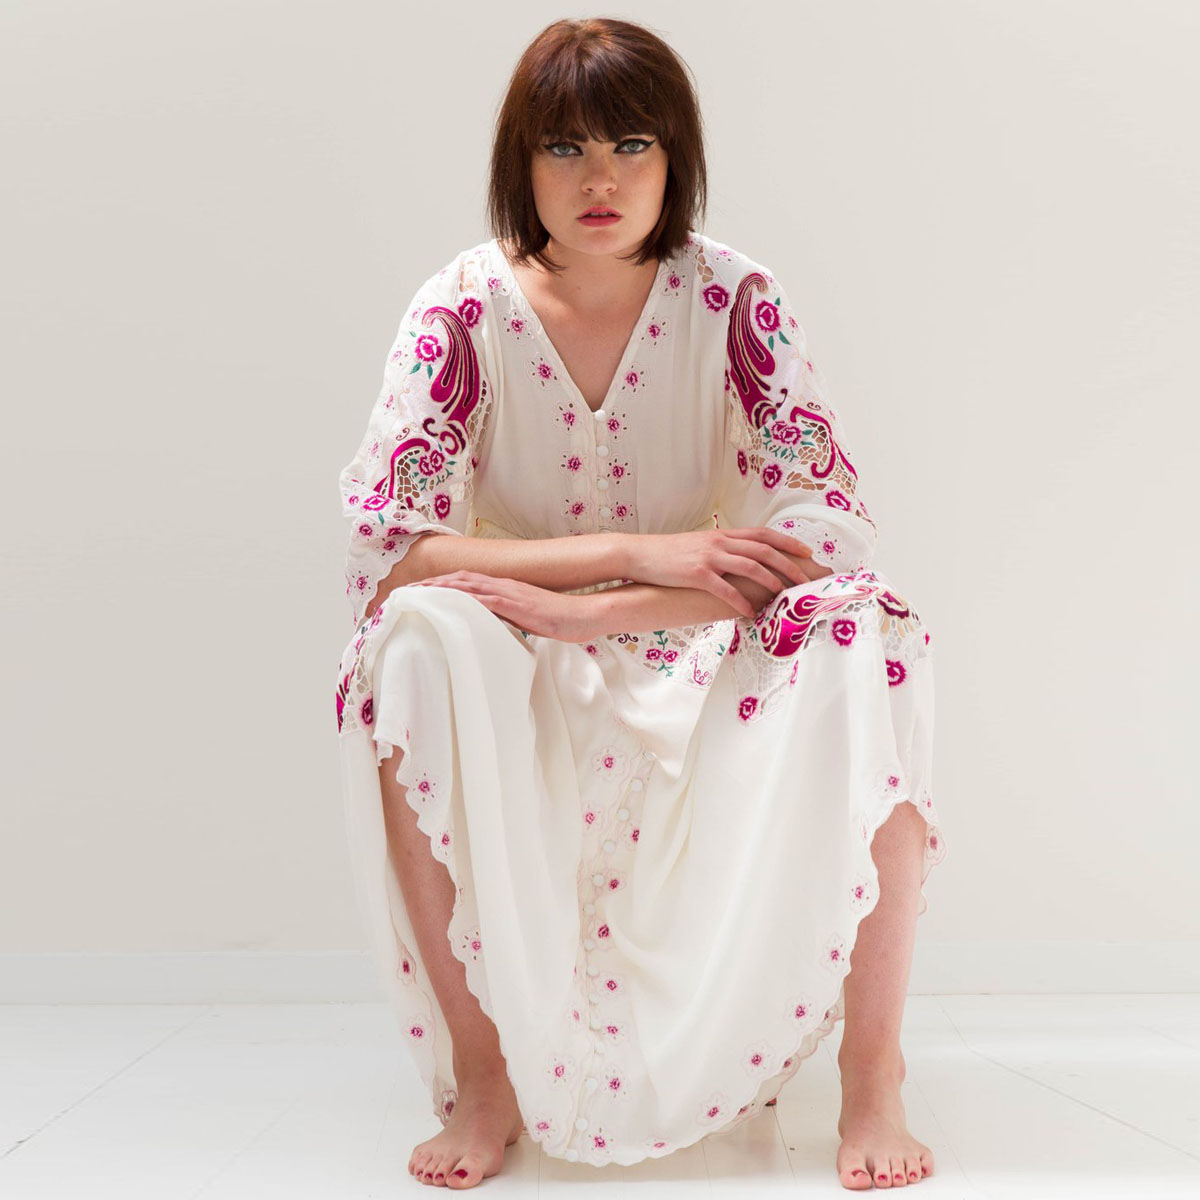 d90069c1811dc US $54.89 37% OFF Jastie Floral Embroidered Boho Dress V Neck Batwing  Sleeve Women Dresses Loose Plus Size Long Maxi Dress Summer Dresses  Vestidos-in ...